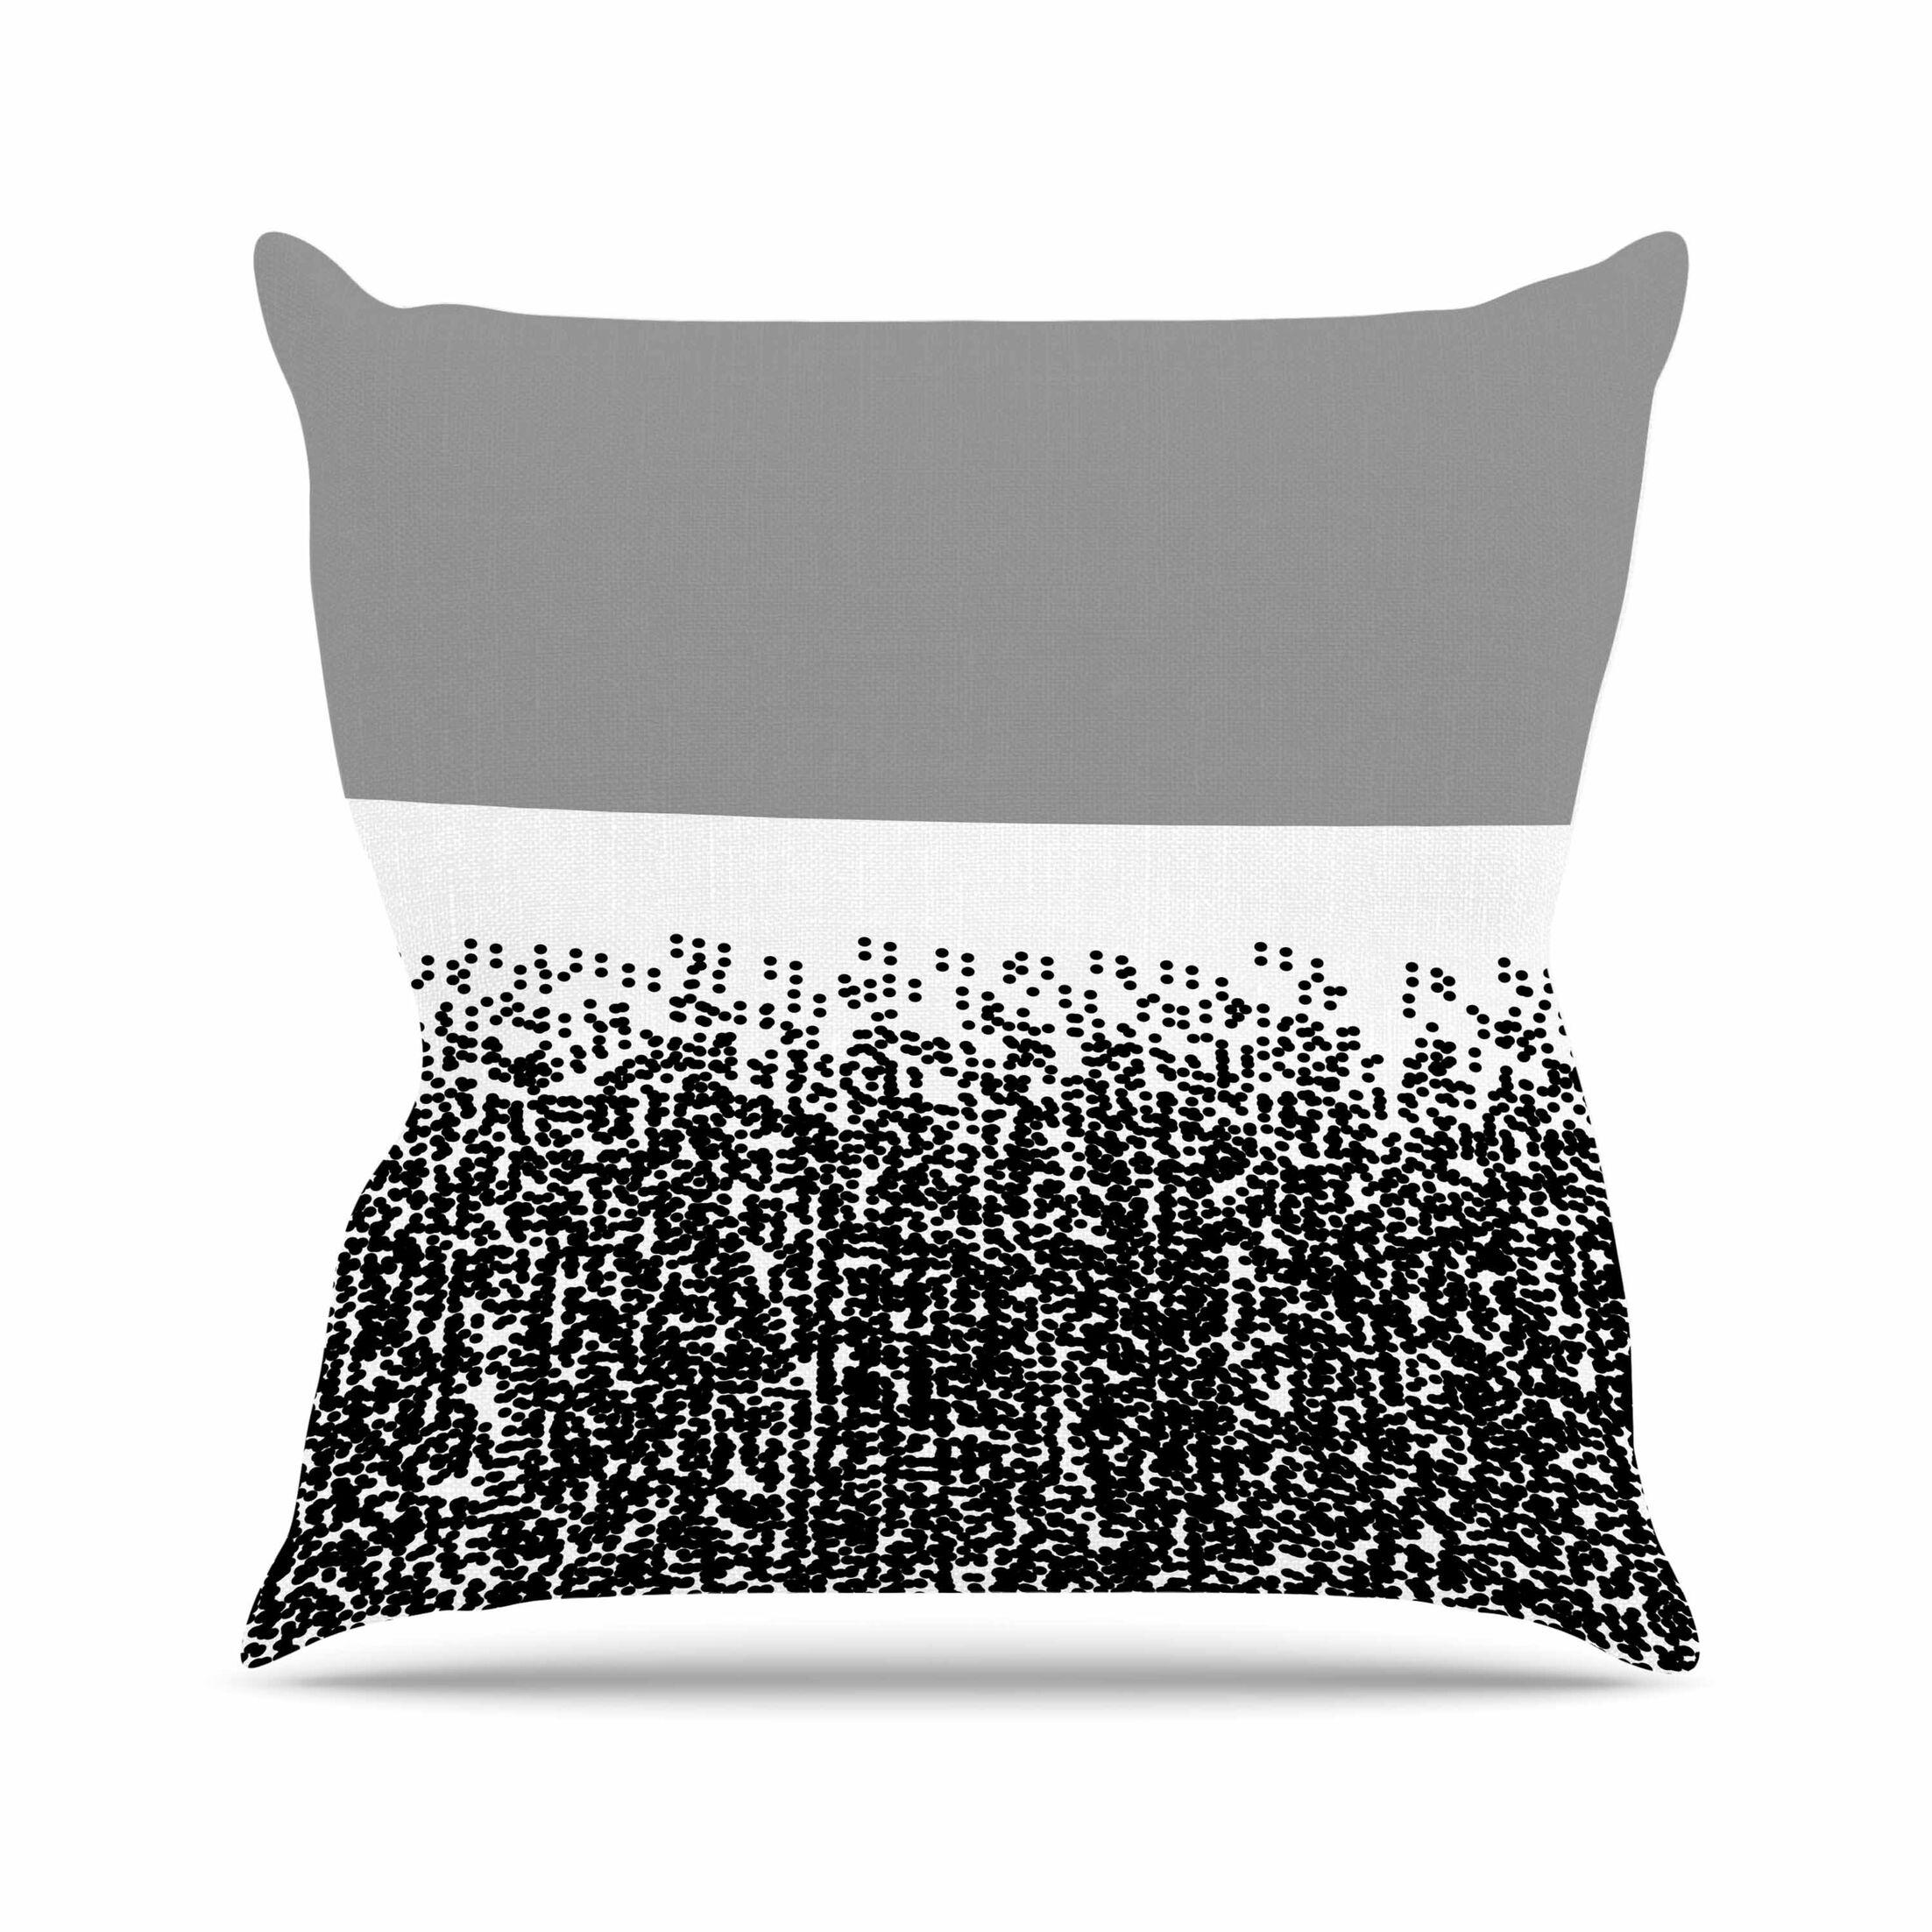 Trebam Bodova Outdoor Throw Pillow Size: 18